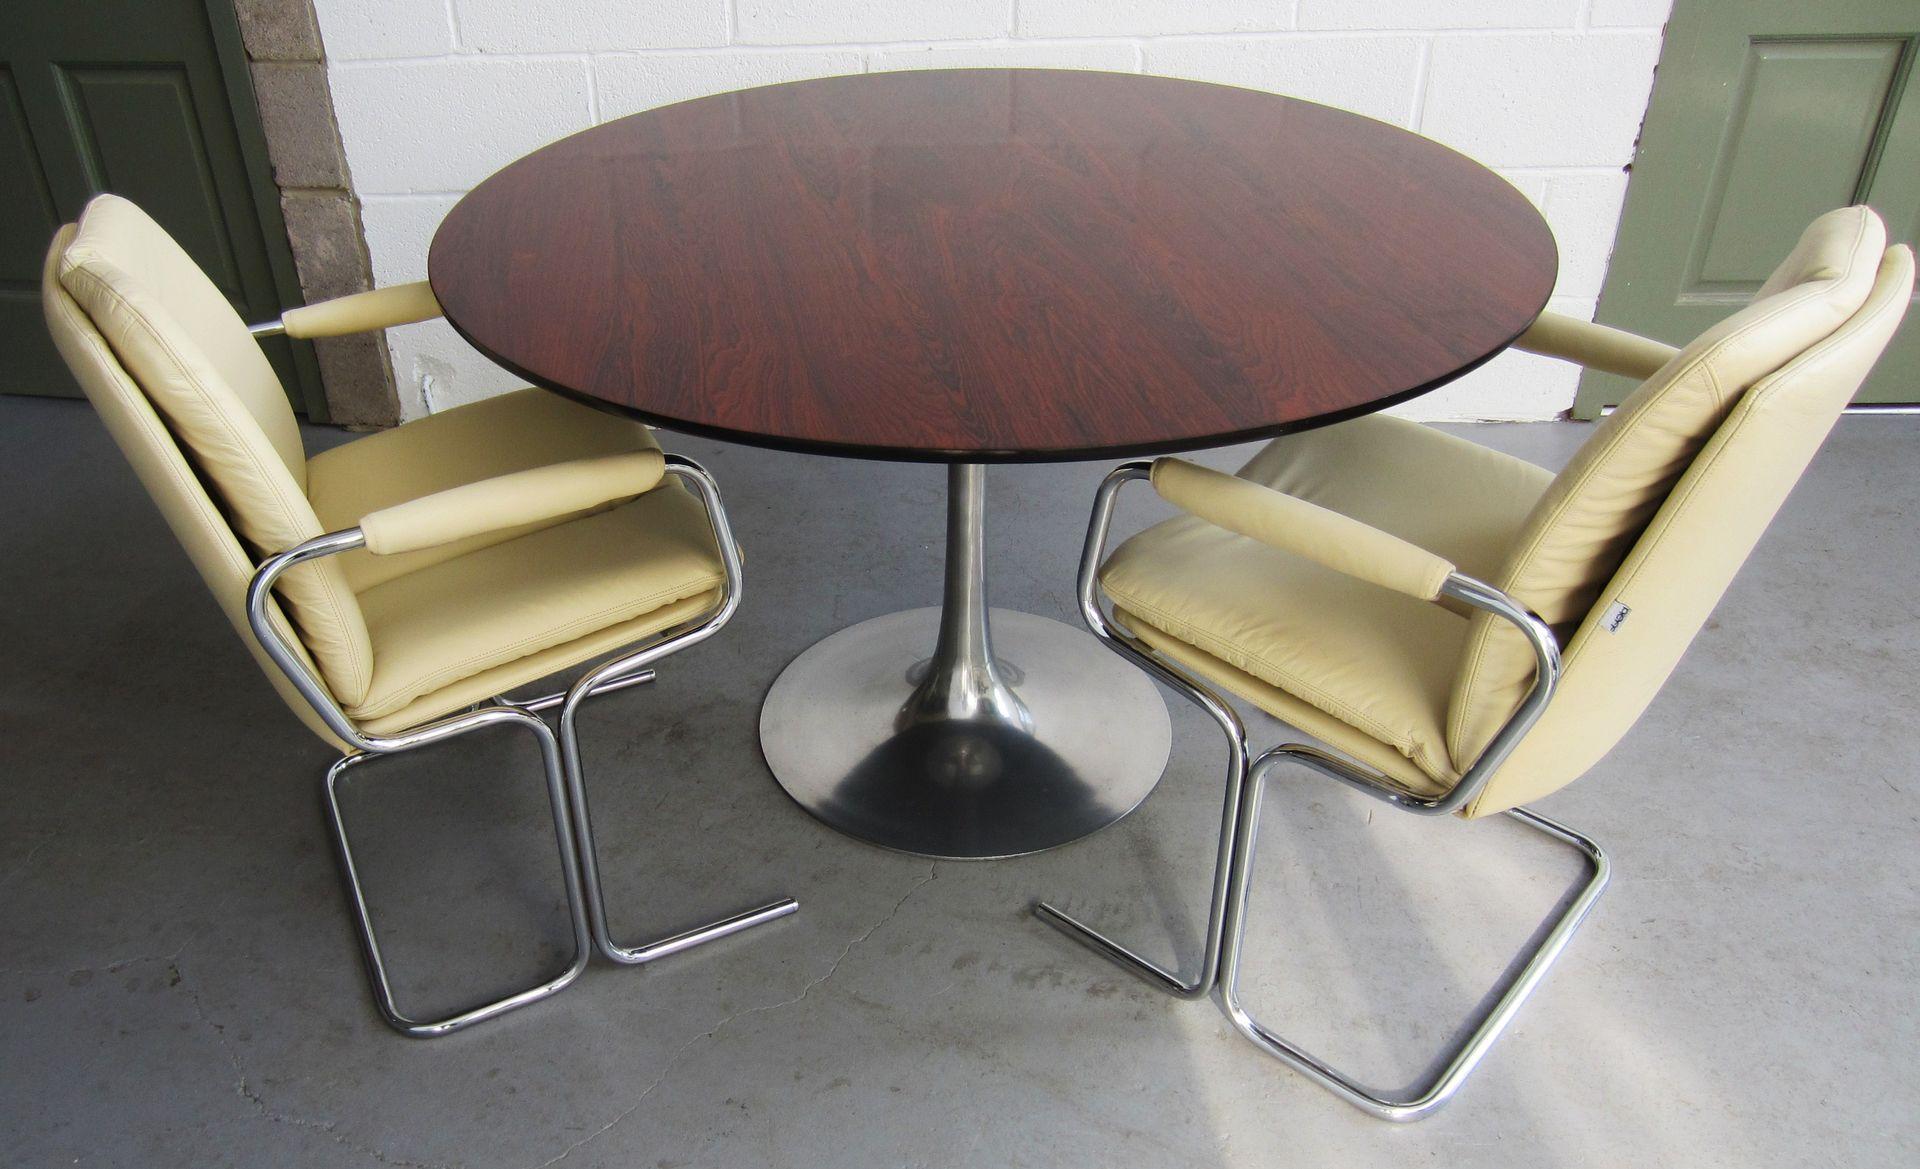 tulpe tisch aus palisanderholz und aluminium von eero saarinen f r arkana bei pamono kaufen. Black Bedroom Furniture Sets. Home Design Ideas